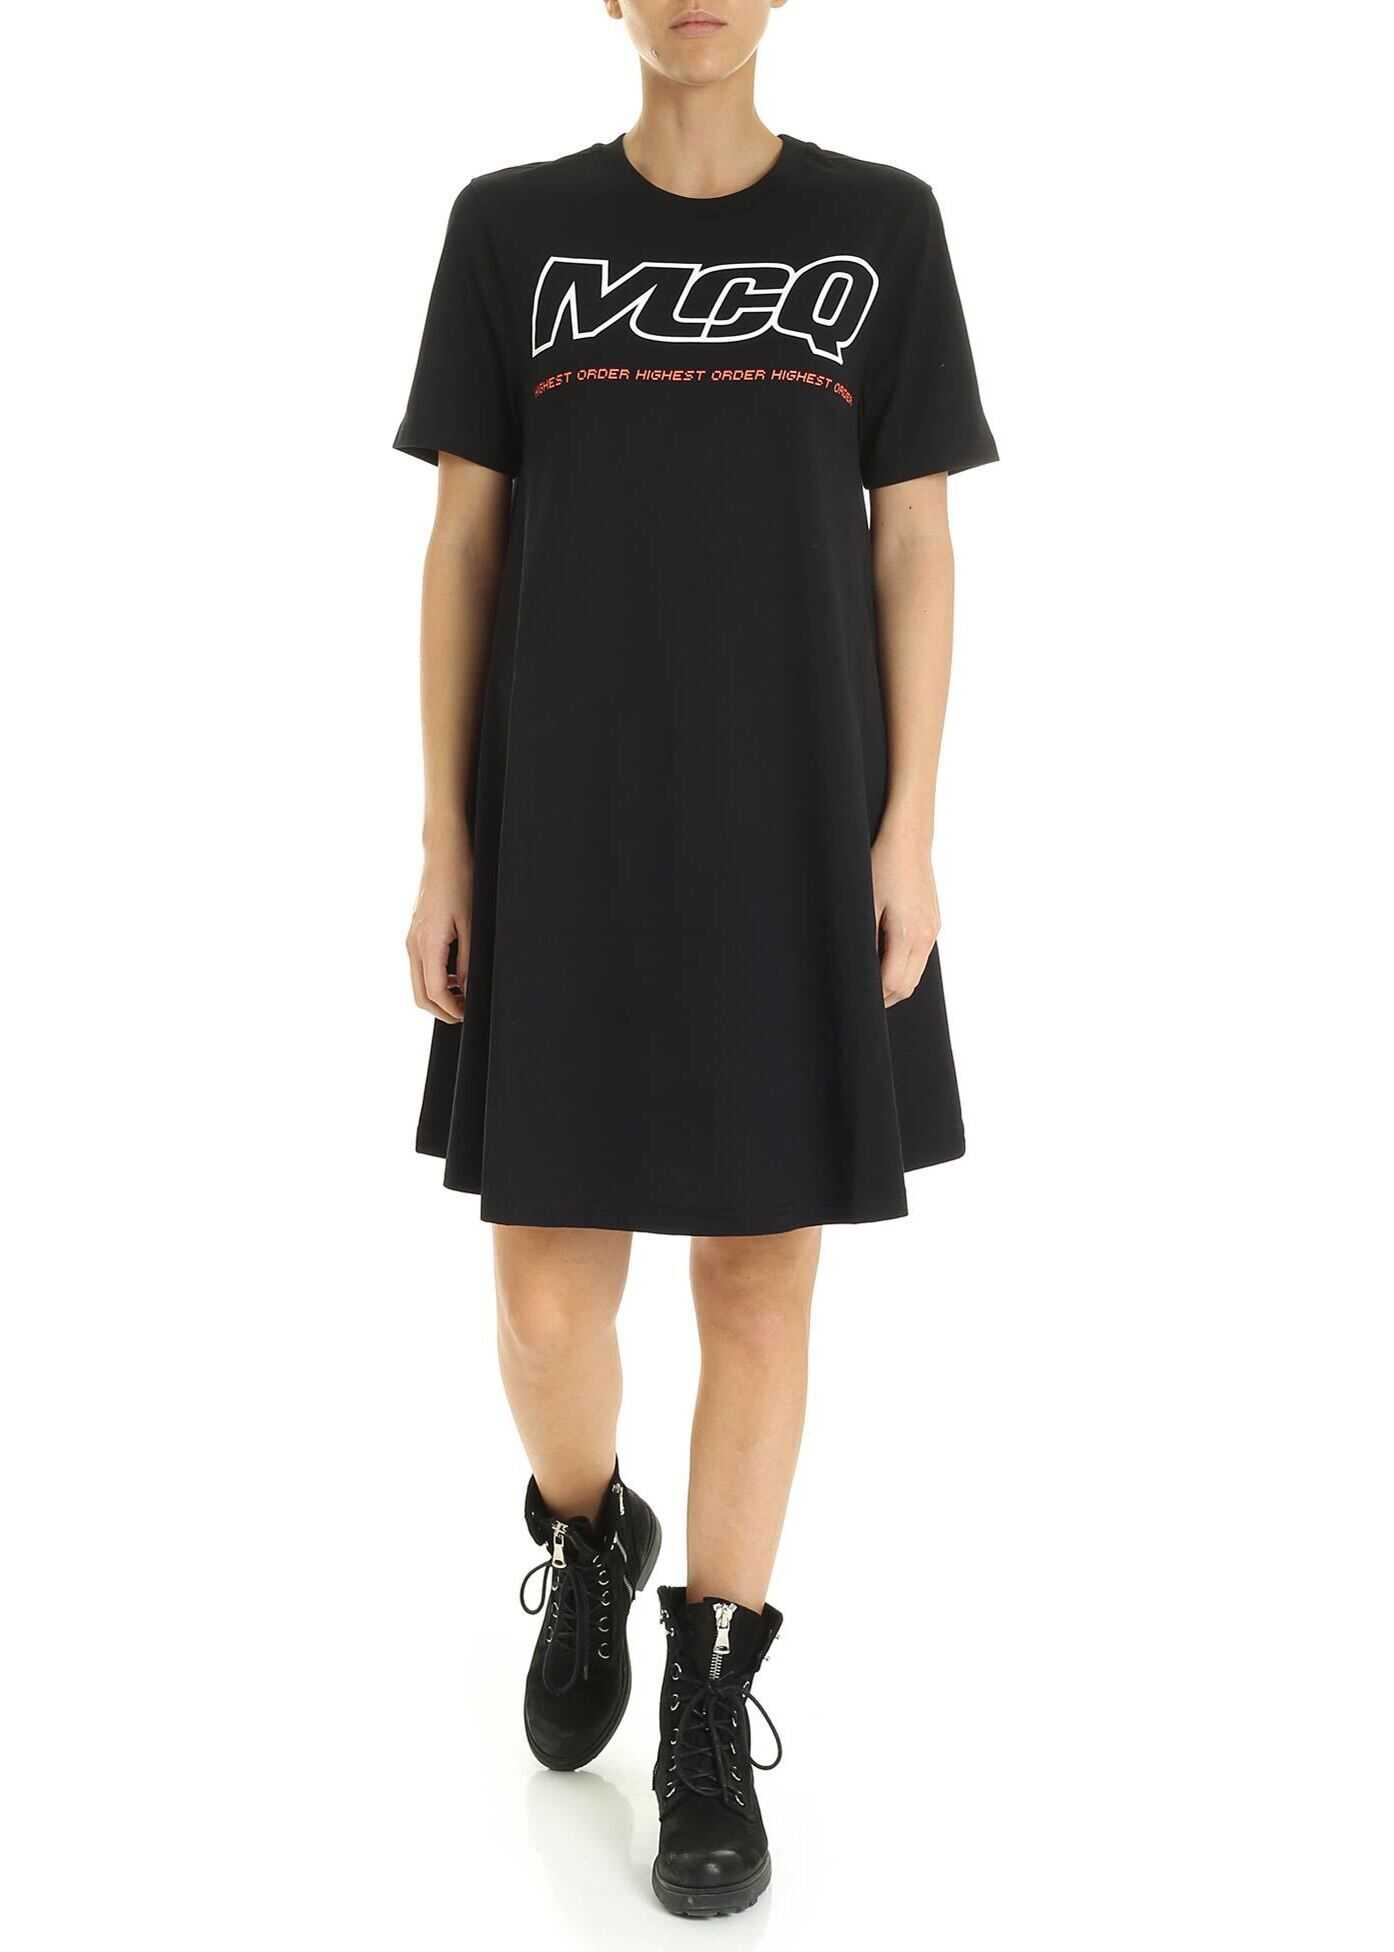 Mcq Highest Order Dress In Black thumbnail